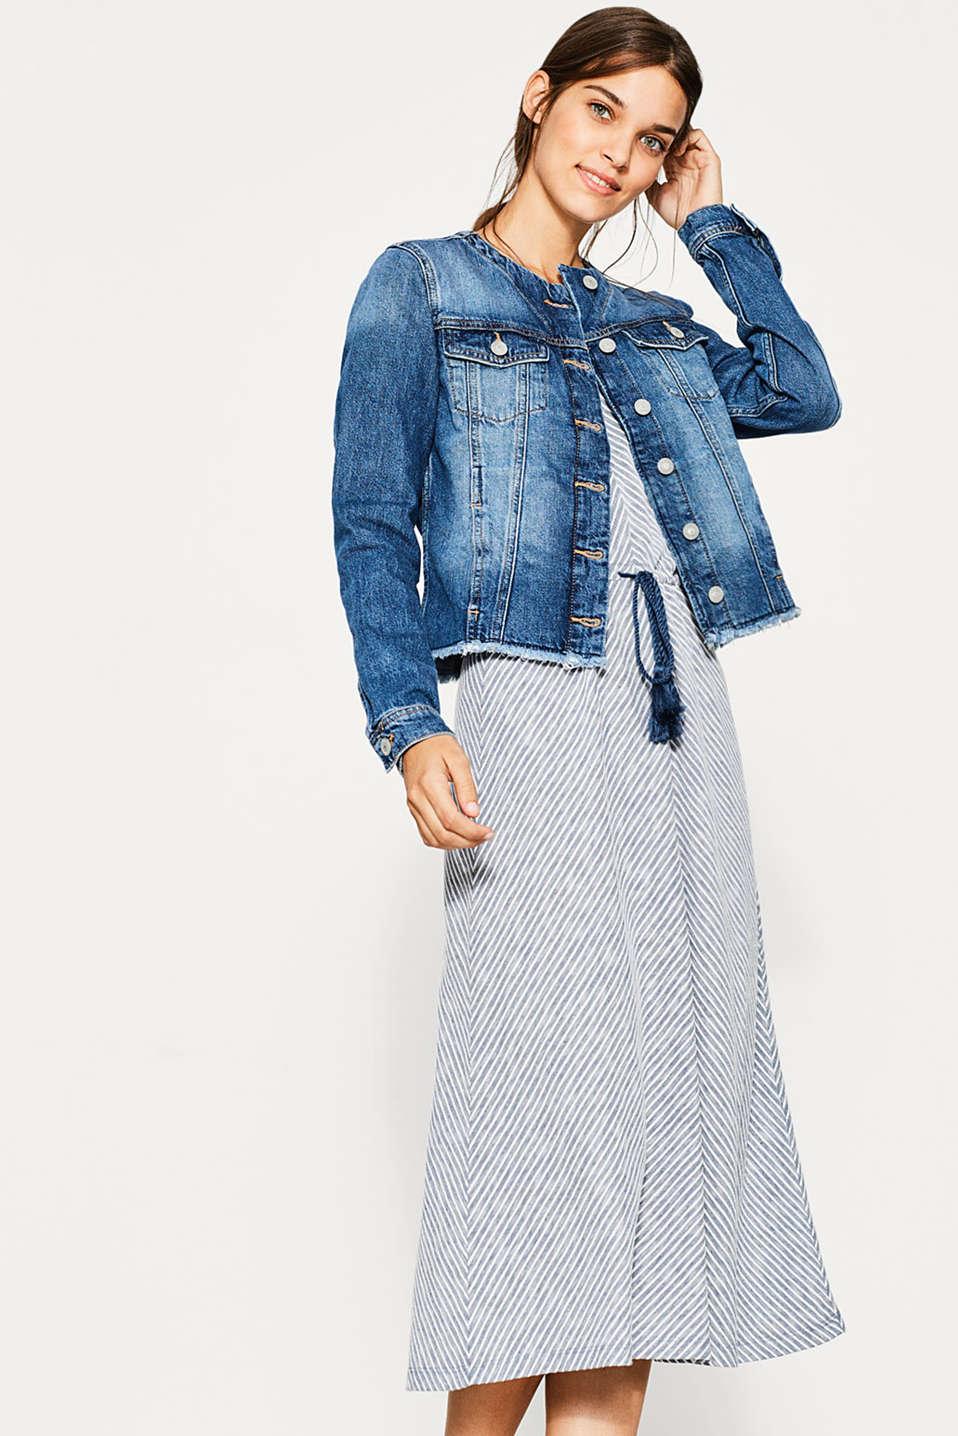 edc jeans jacke aus 100 baumwolle im online shop kaufen. Black Bedroom Furniture Sets. Home Design Ideas